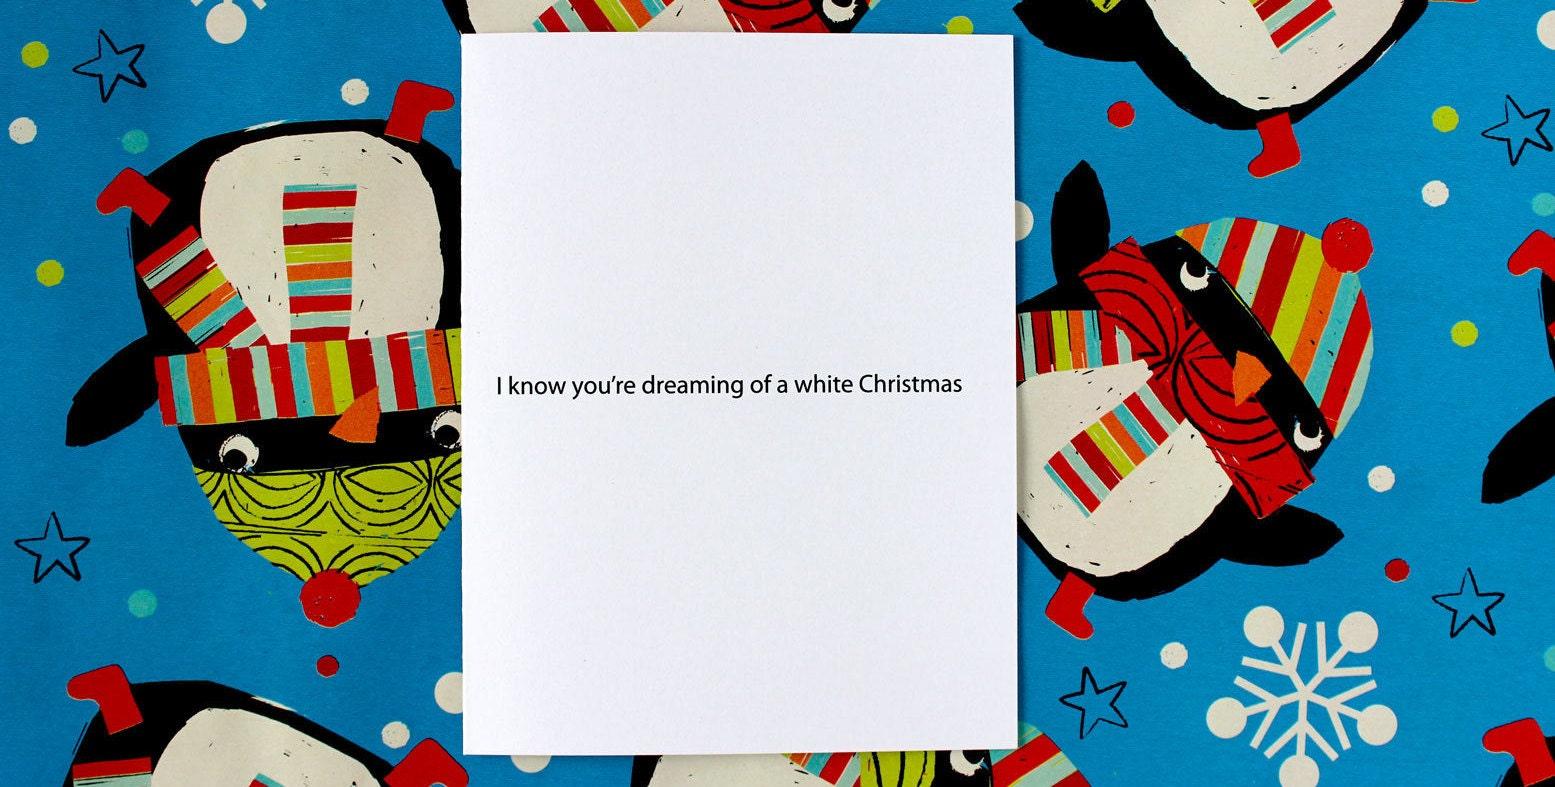 Rude Christmas Card Funny Christmas Card Meme Christmas | Etsy